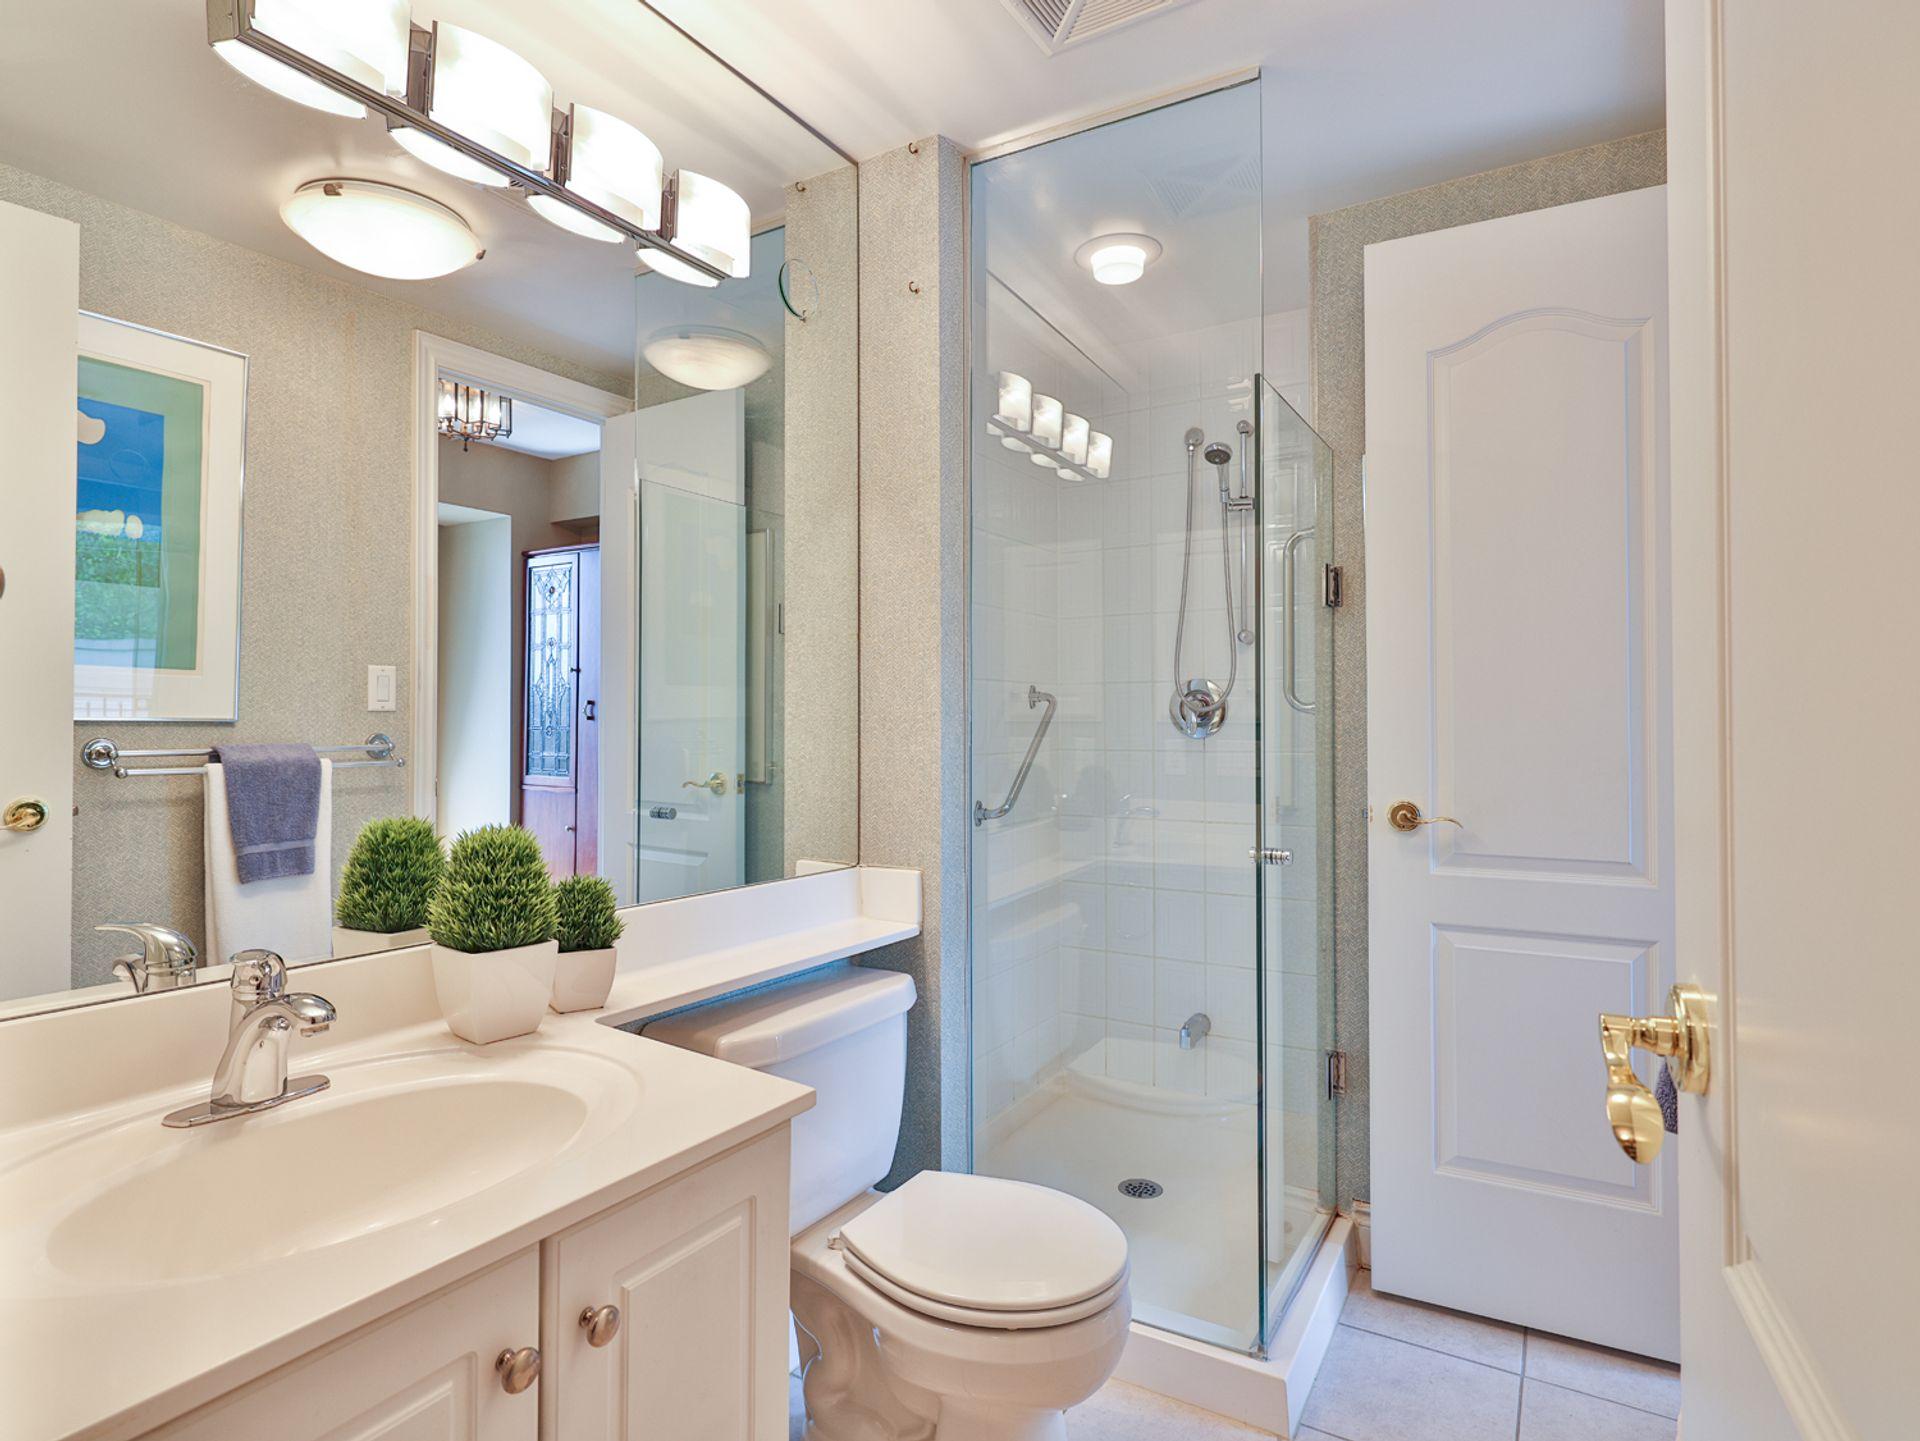 3 Piece Semi Ensuite Bathroom at 914 - 38 William Carson Crescent, St. Andrew-Windfields, Toronto